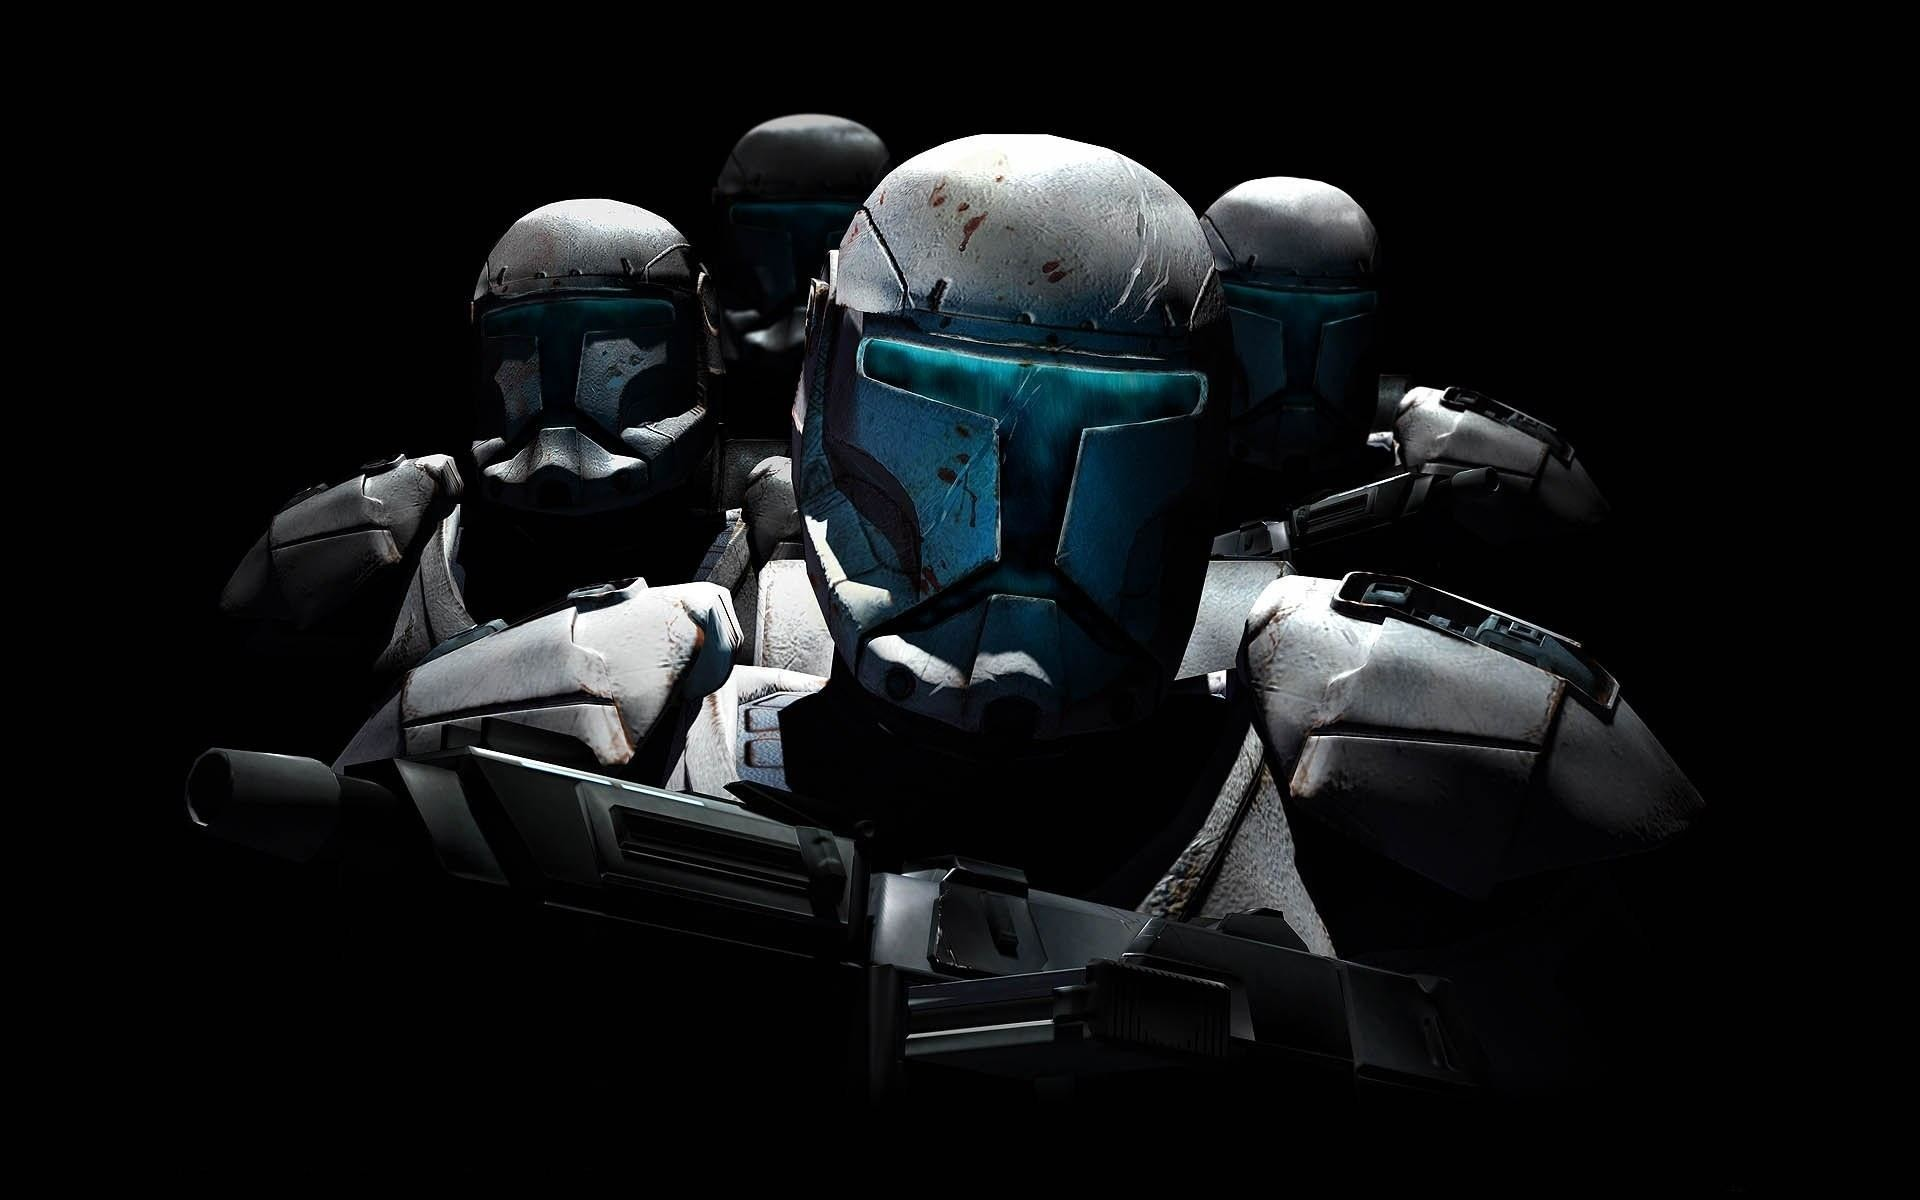 Res: 1920x1200, HD Star Wars stormtroopers Wallpaper. Download: Star Wars stormtroopers